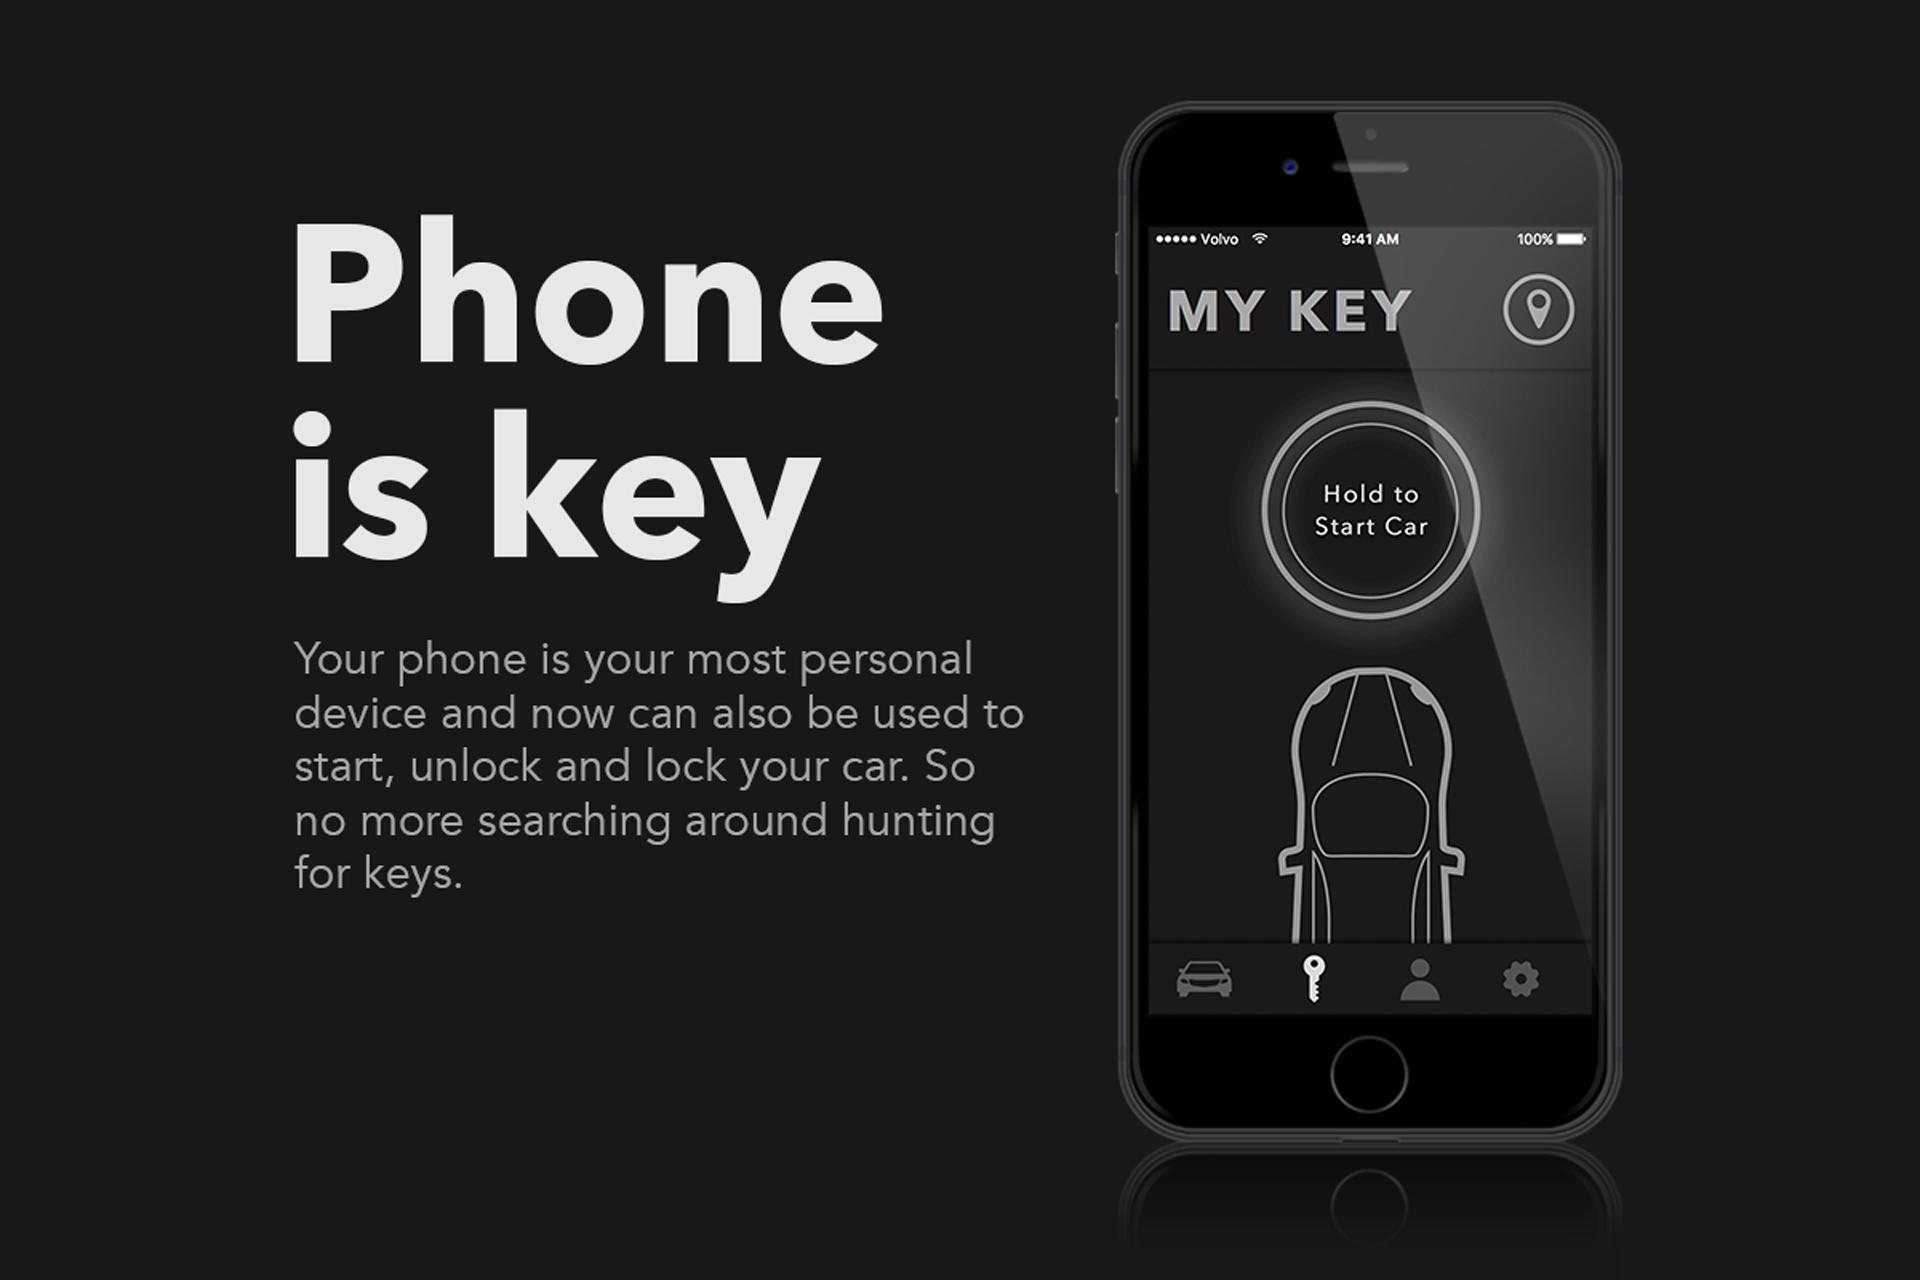 Phone is key